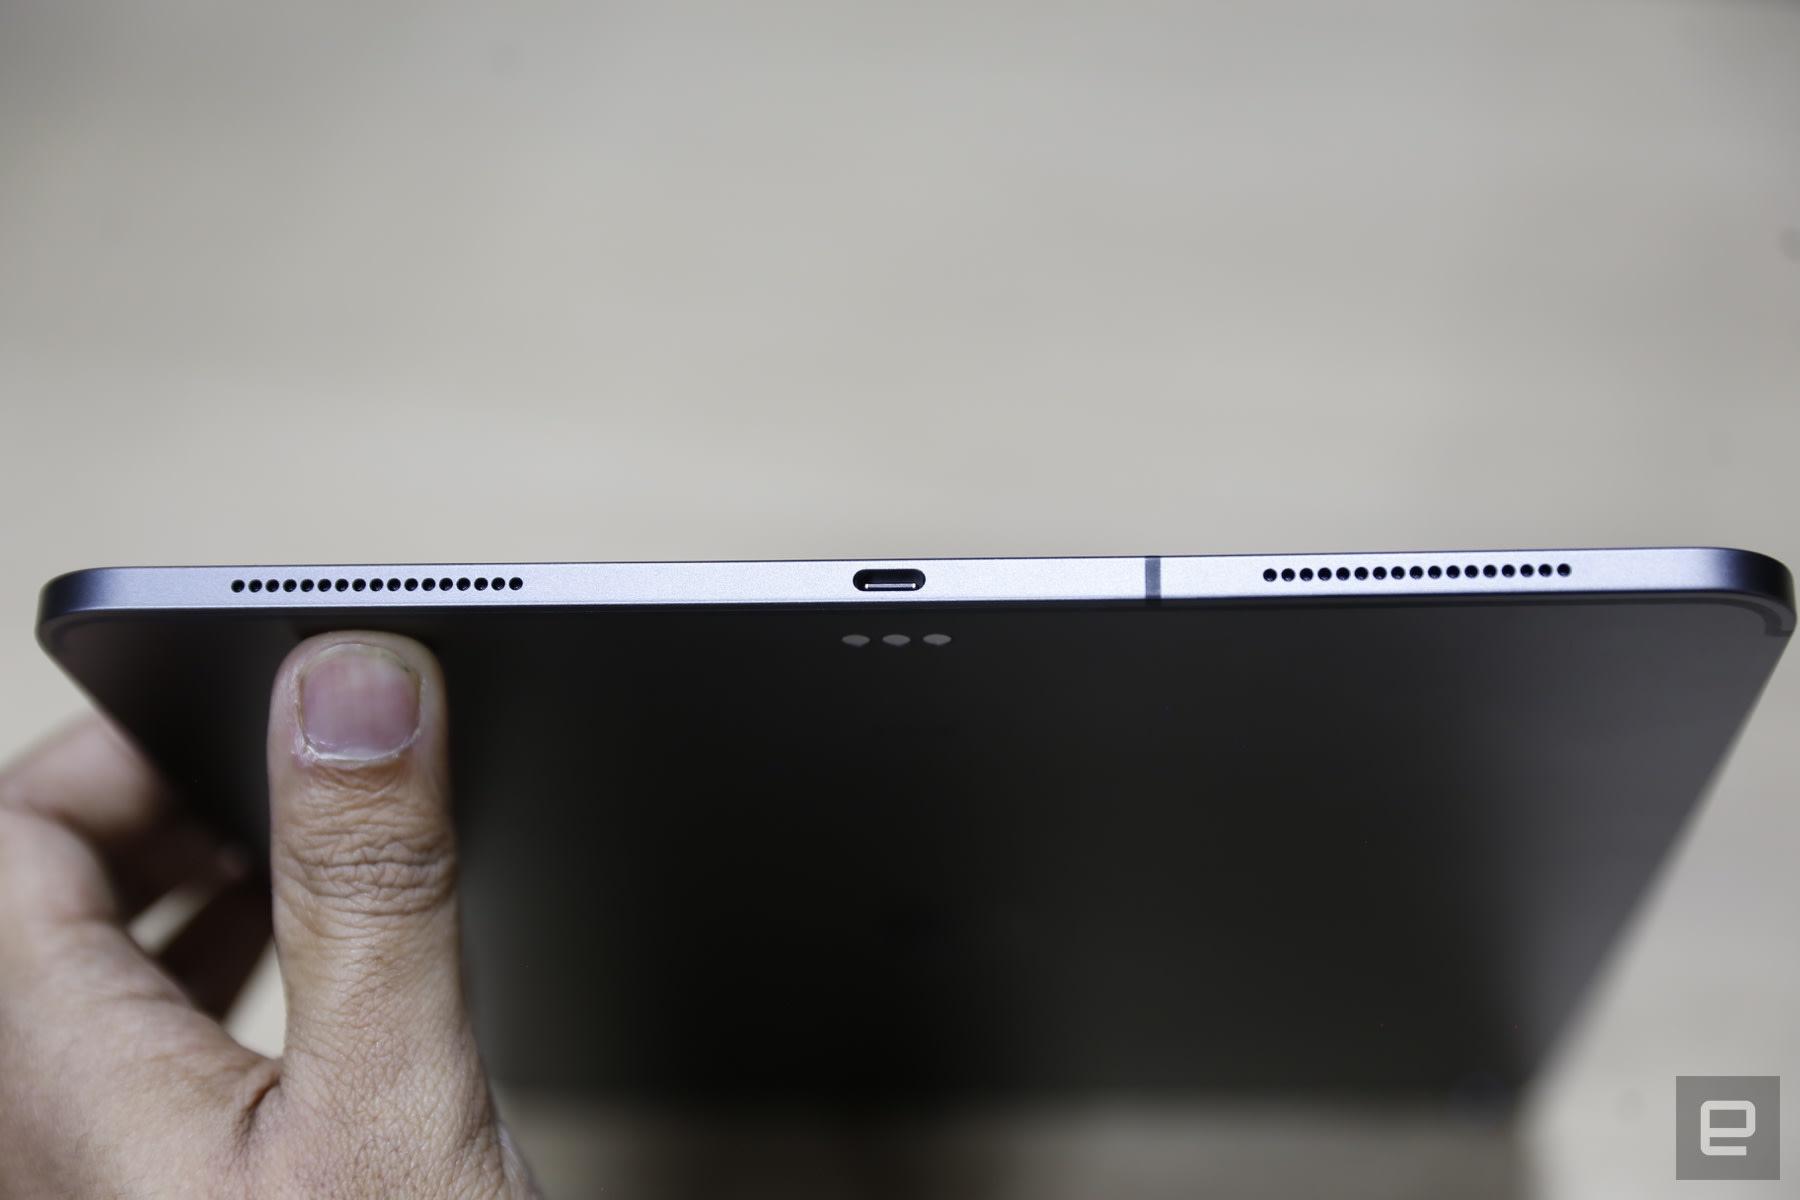 iPad Pro 2018 hands-on